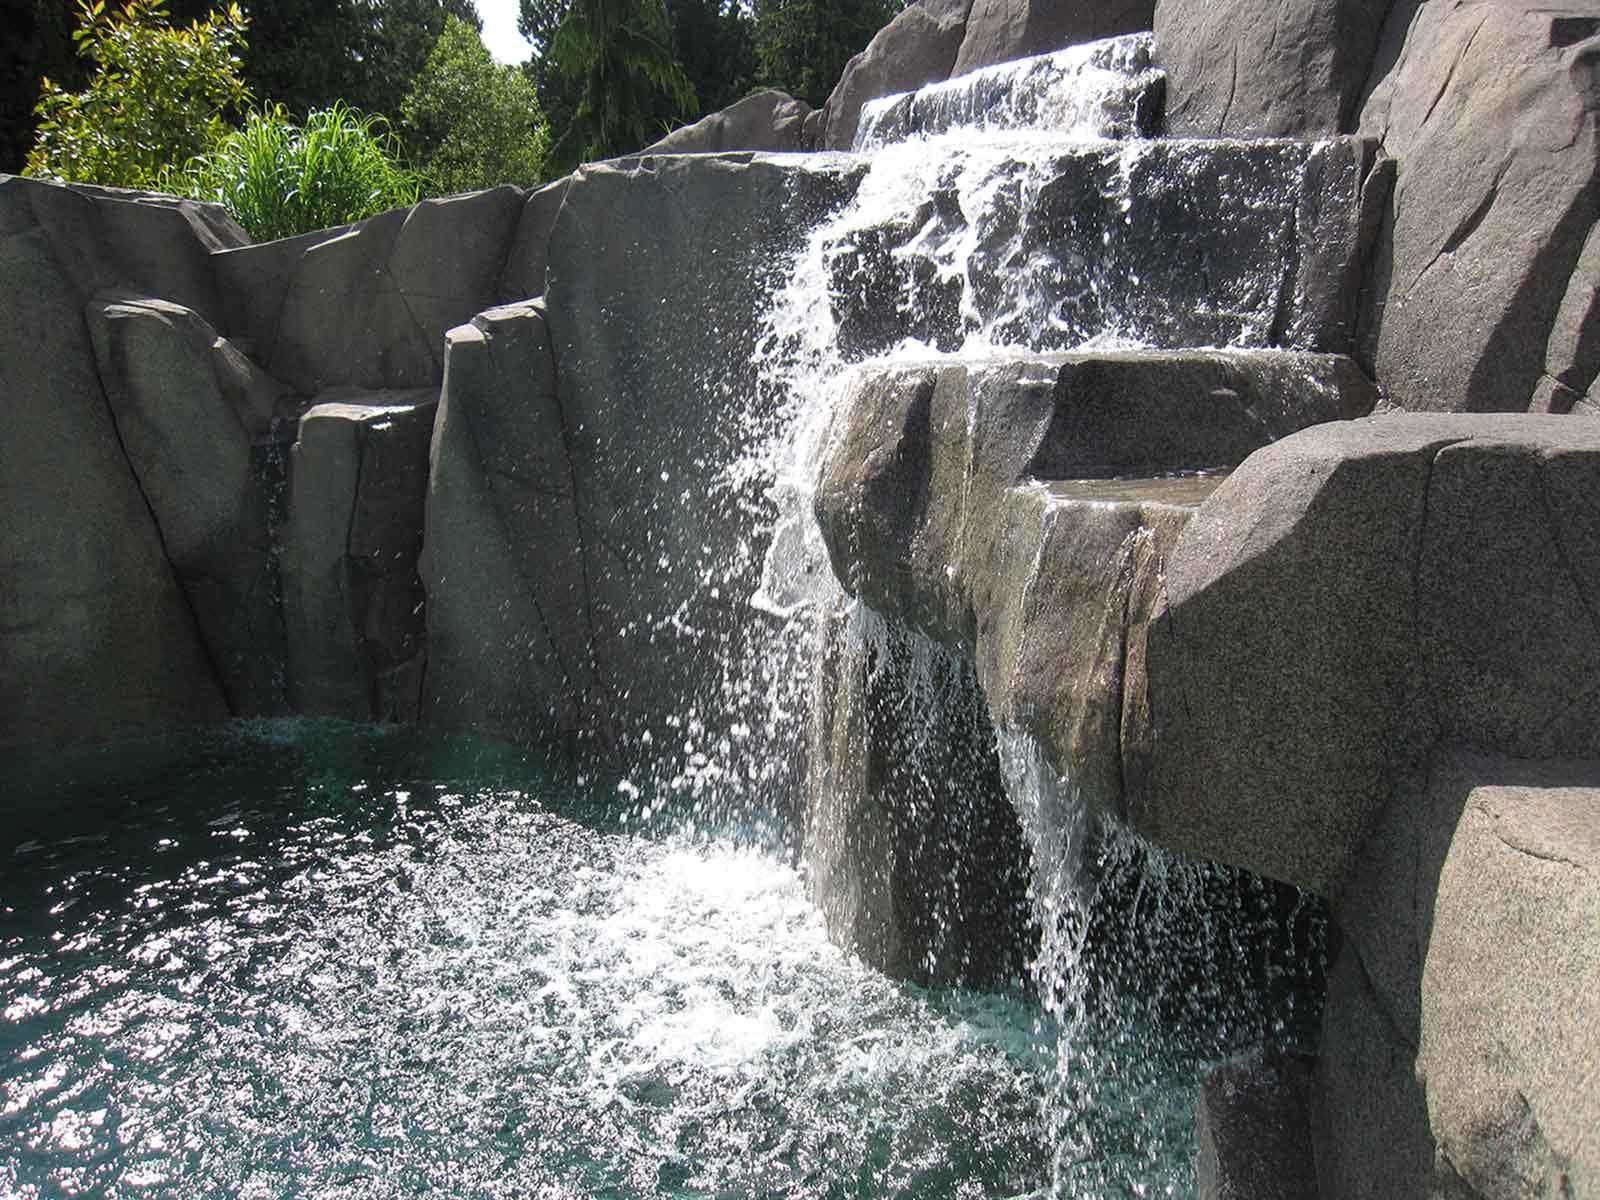 Concrete water fall